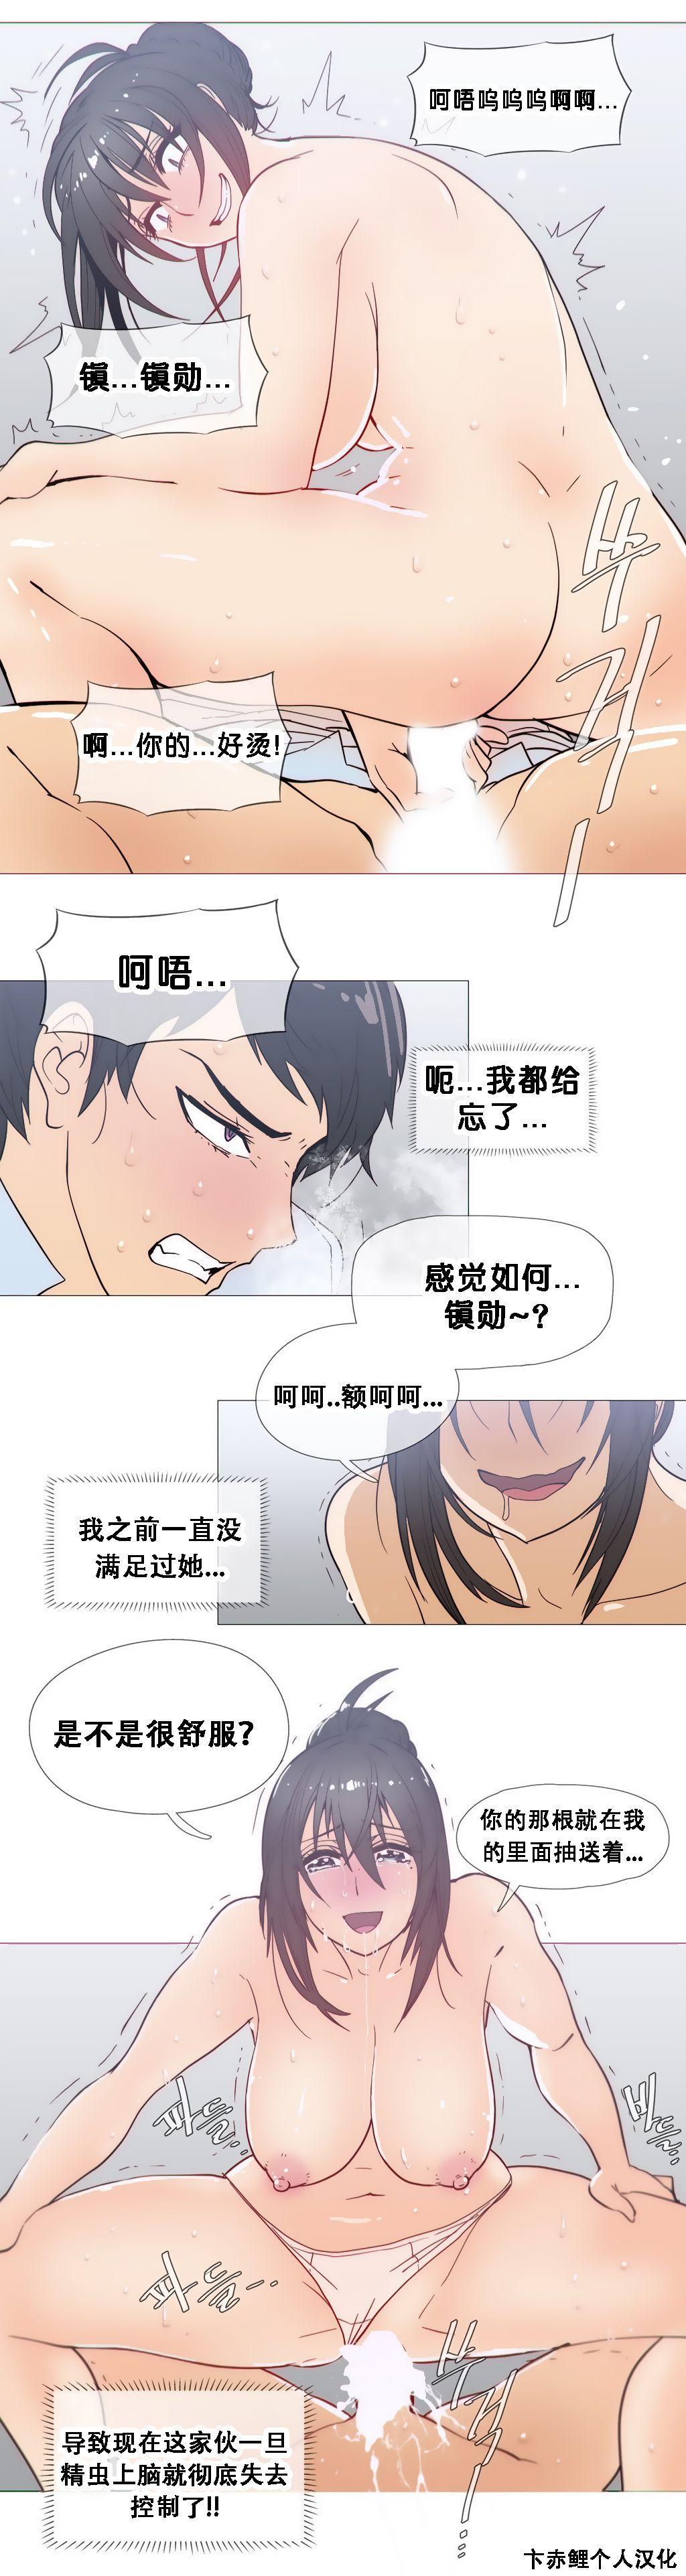 HouseHold Affairs 【卞赤鲤个人汉化】1~33话(持续更新中) 517